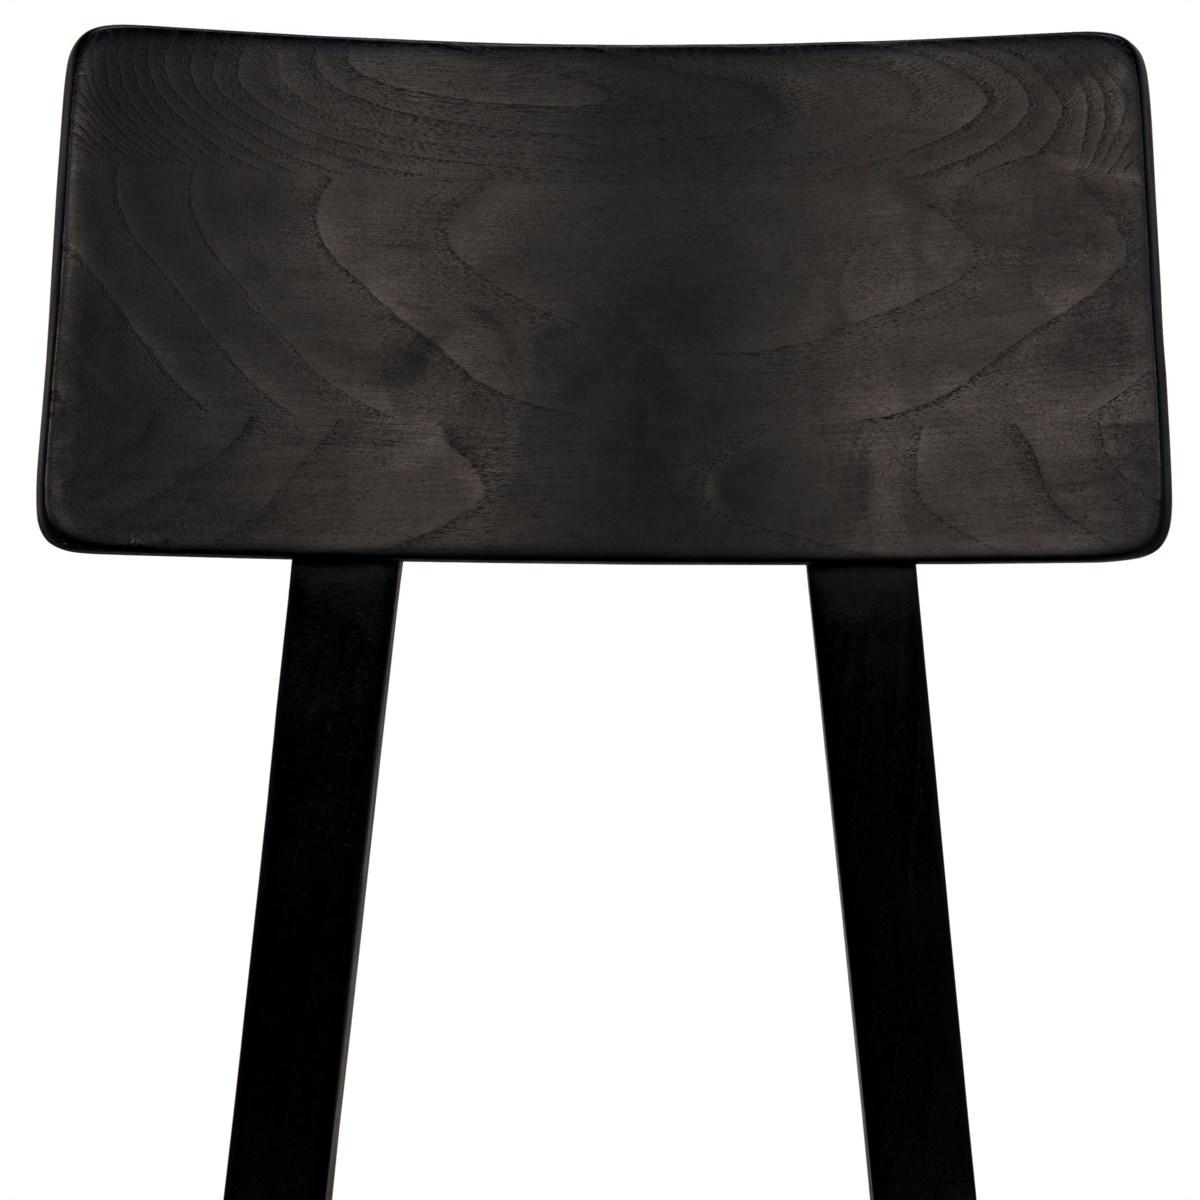 Kimi Chair, Charcoal Black